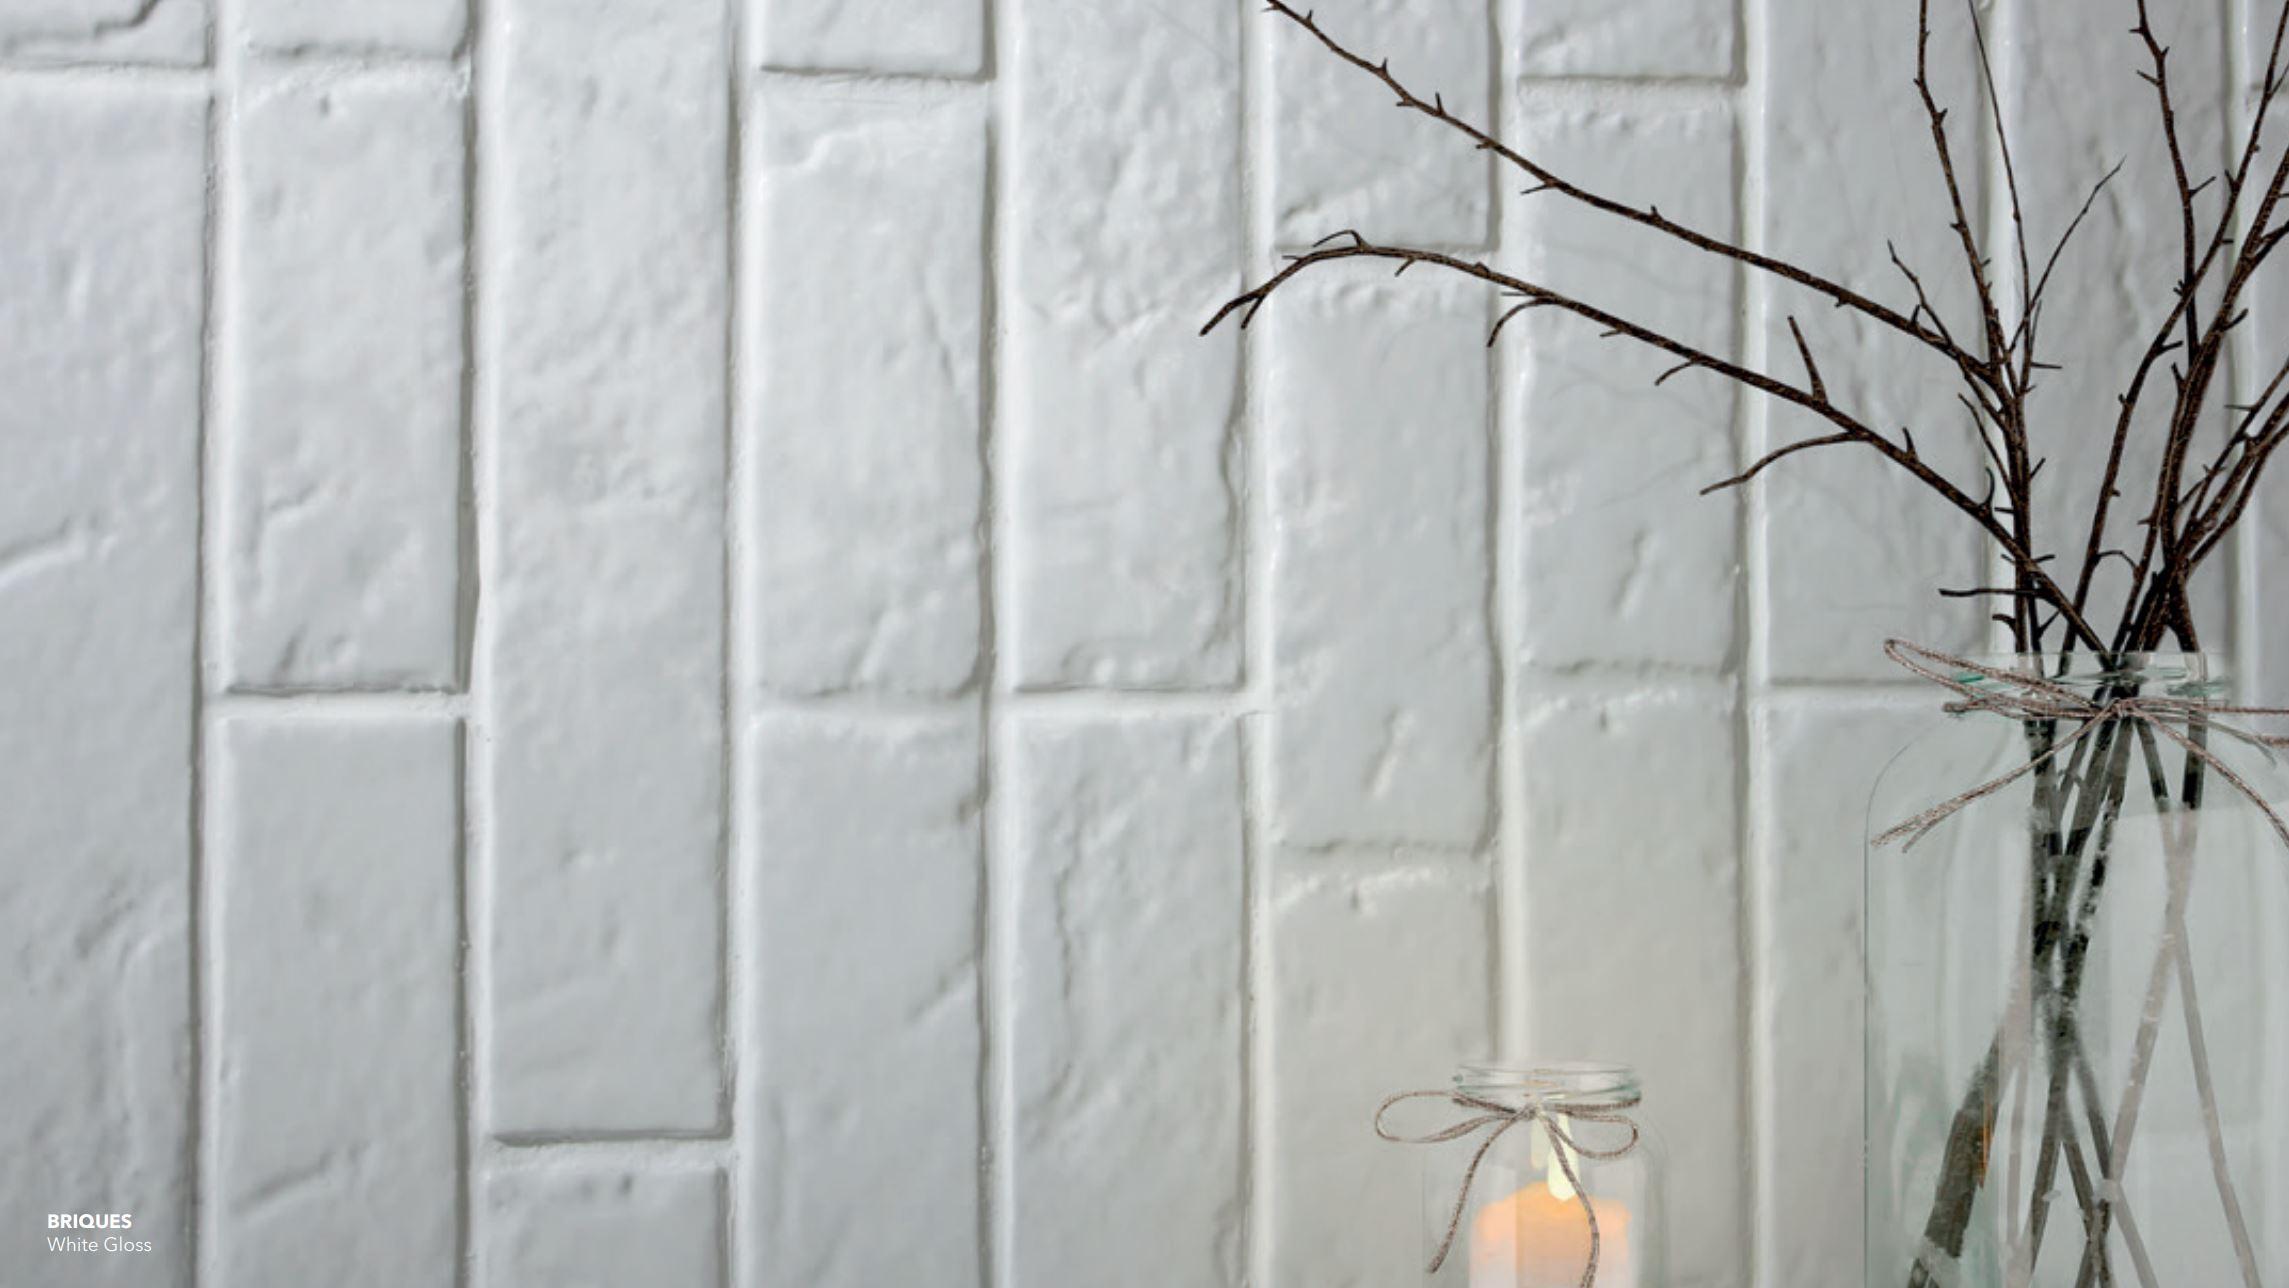 Briques White Gloss